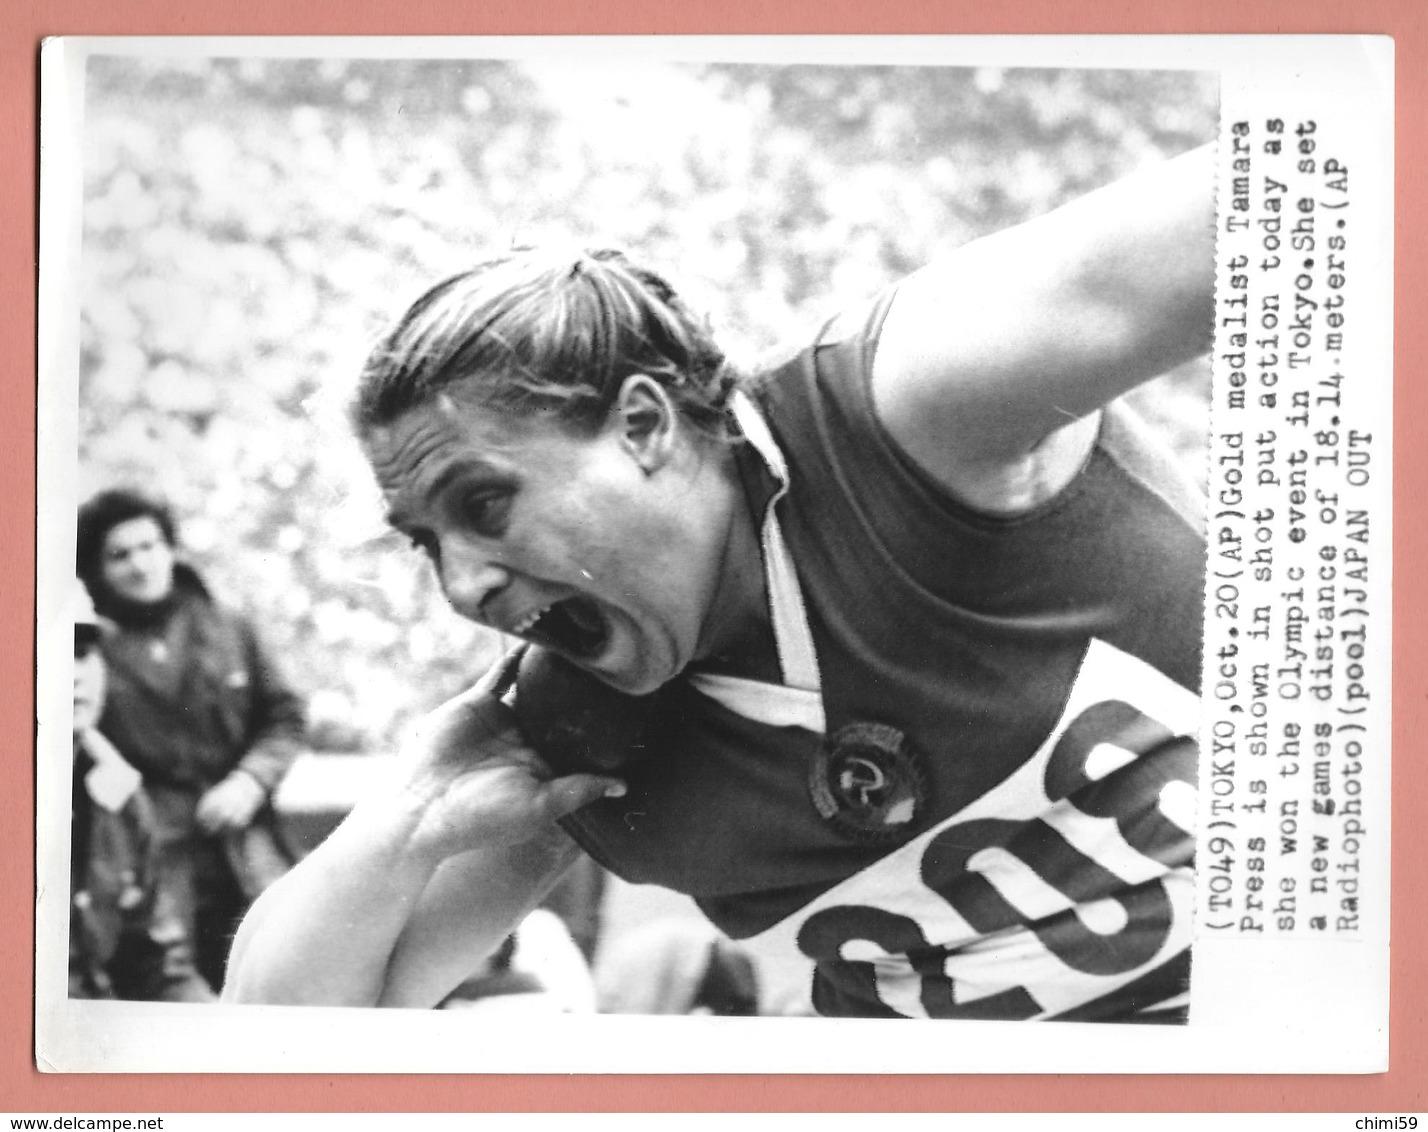 PHOTO PRESS -  LANCIO DEL PESO - Tamara Andreevna Tyškevič ?????? URSS -  TOKYO - Sport